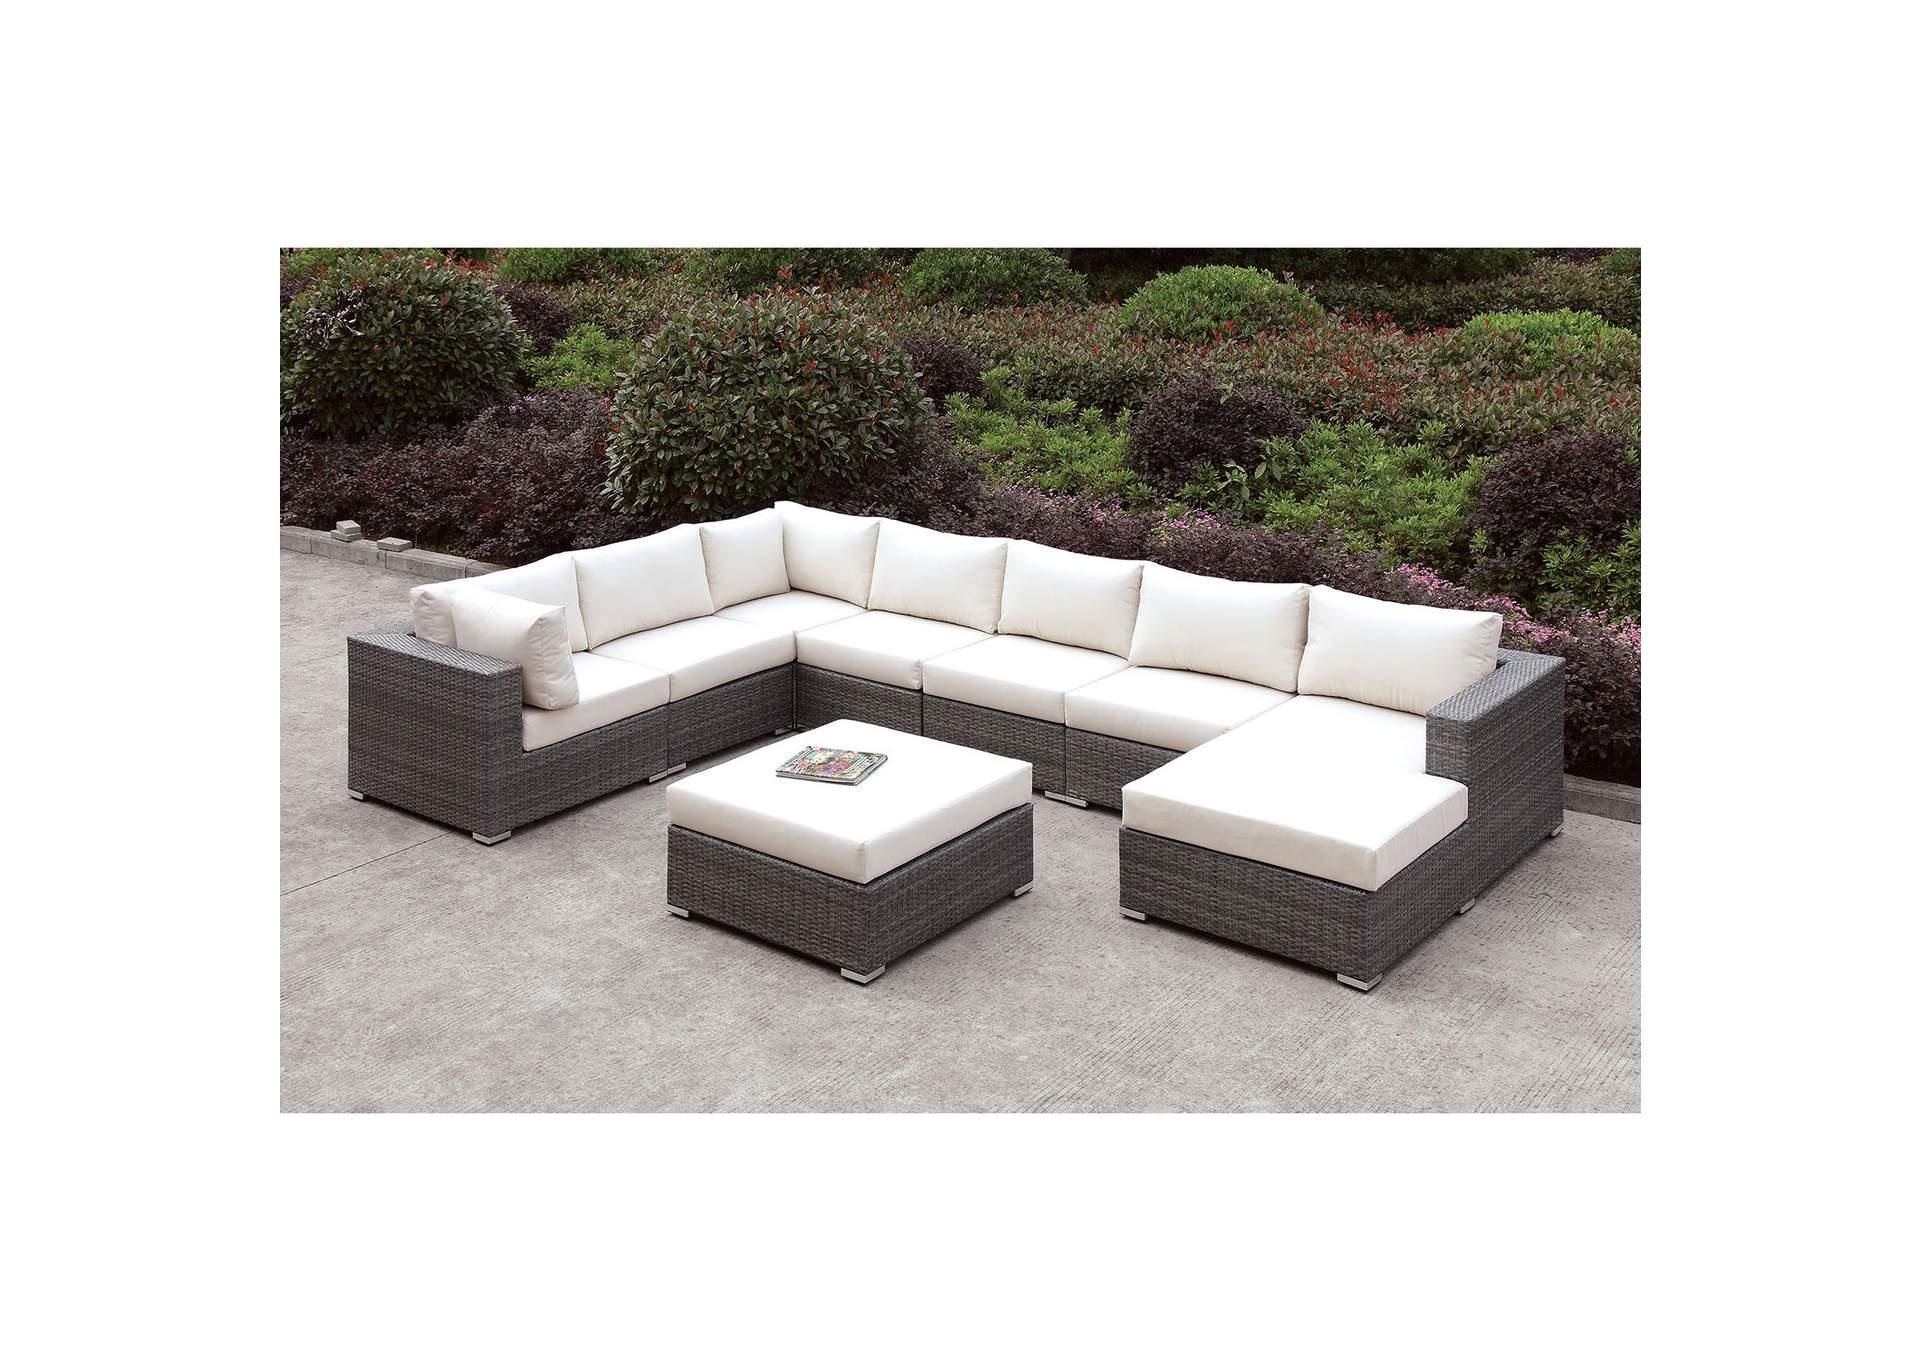 Wondrous Sweet Home Furniture By Niposul Somani Light Gray Ivory Uwap Interior Chair Design Uwaporg